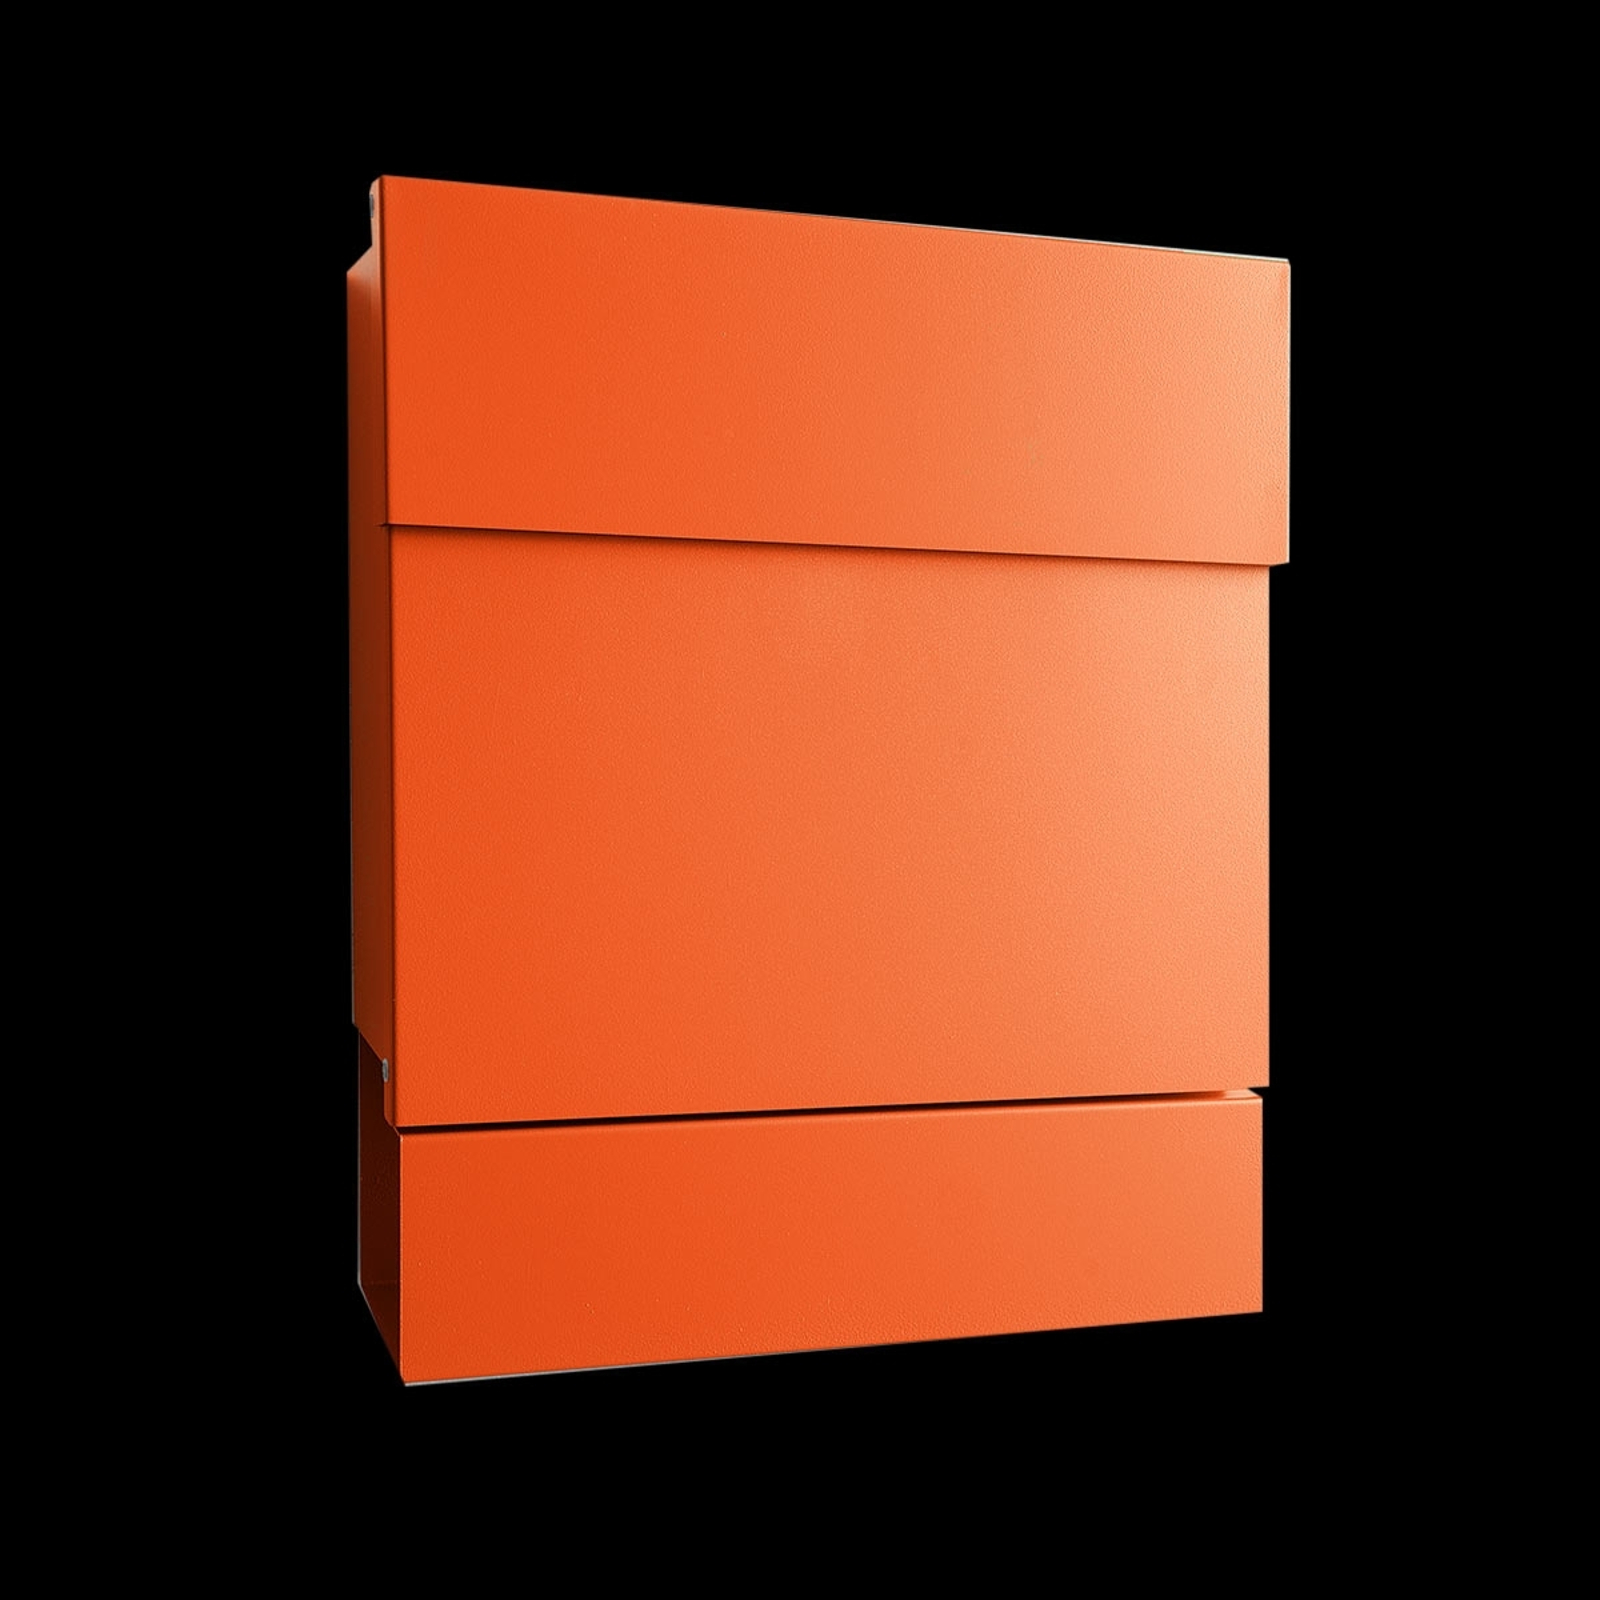 Boîte aux lettre large Letterman V orange